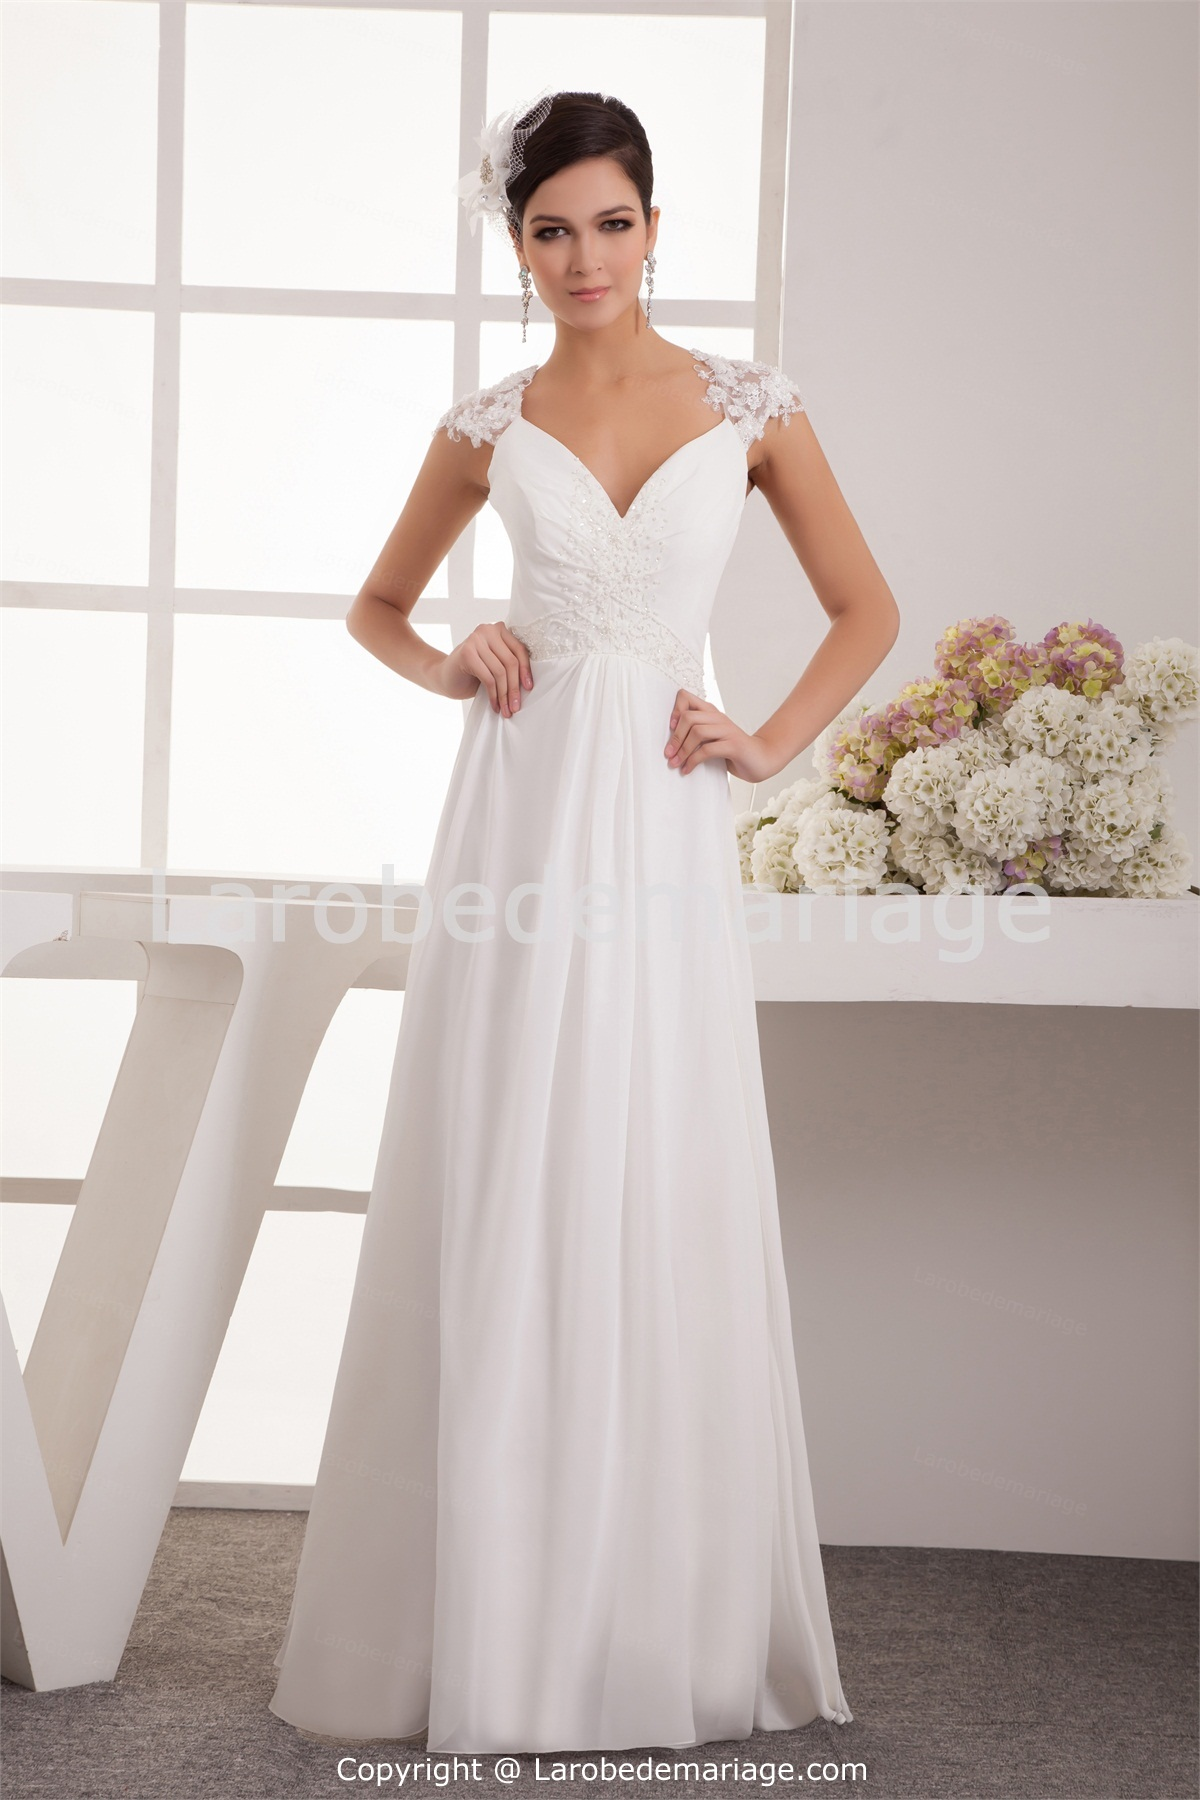 813595891a2 Robe mariée simple manoukian robe